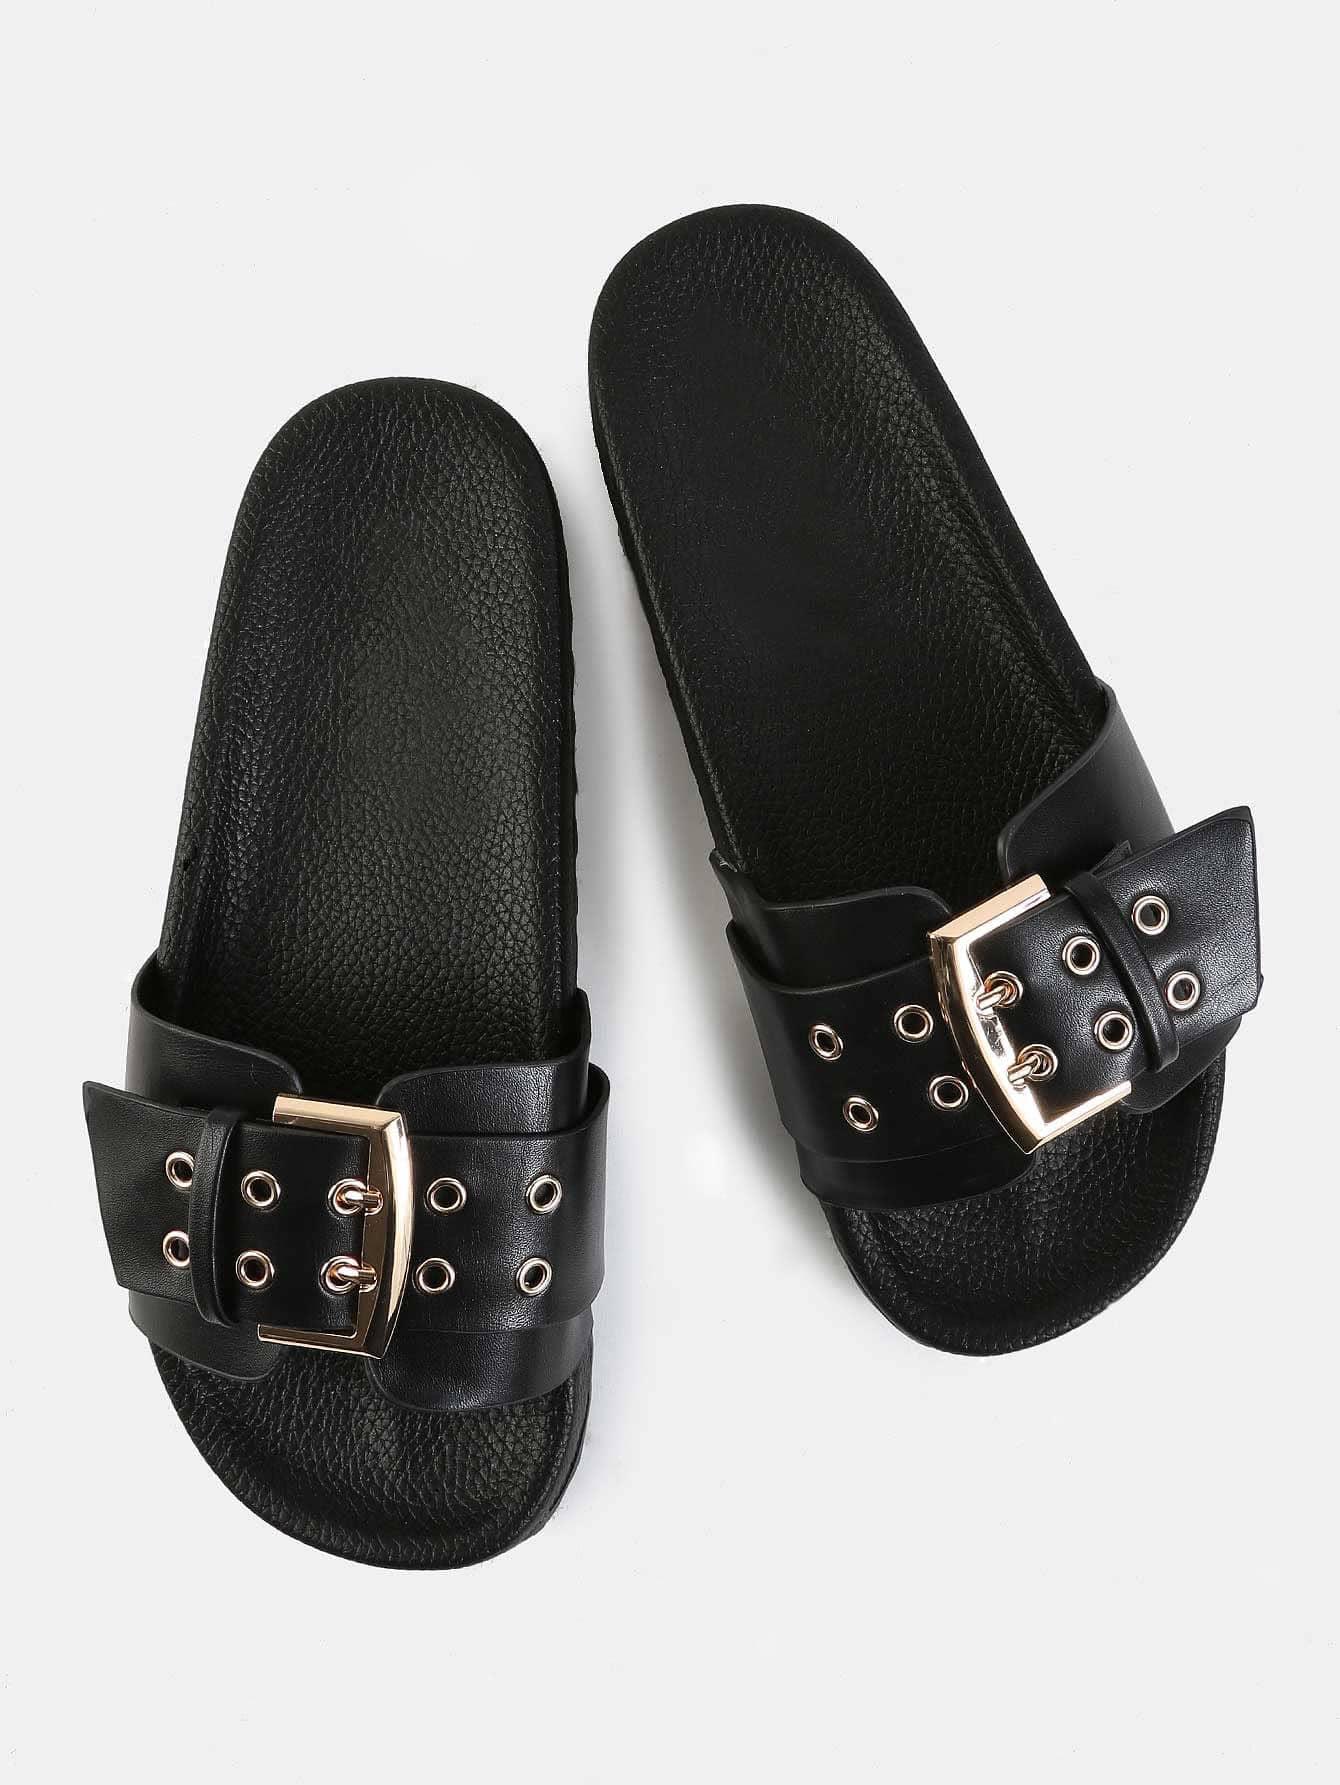 Black sandals chunky - Black Sandals Chunky 9